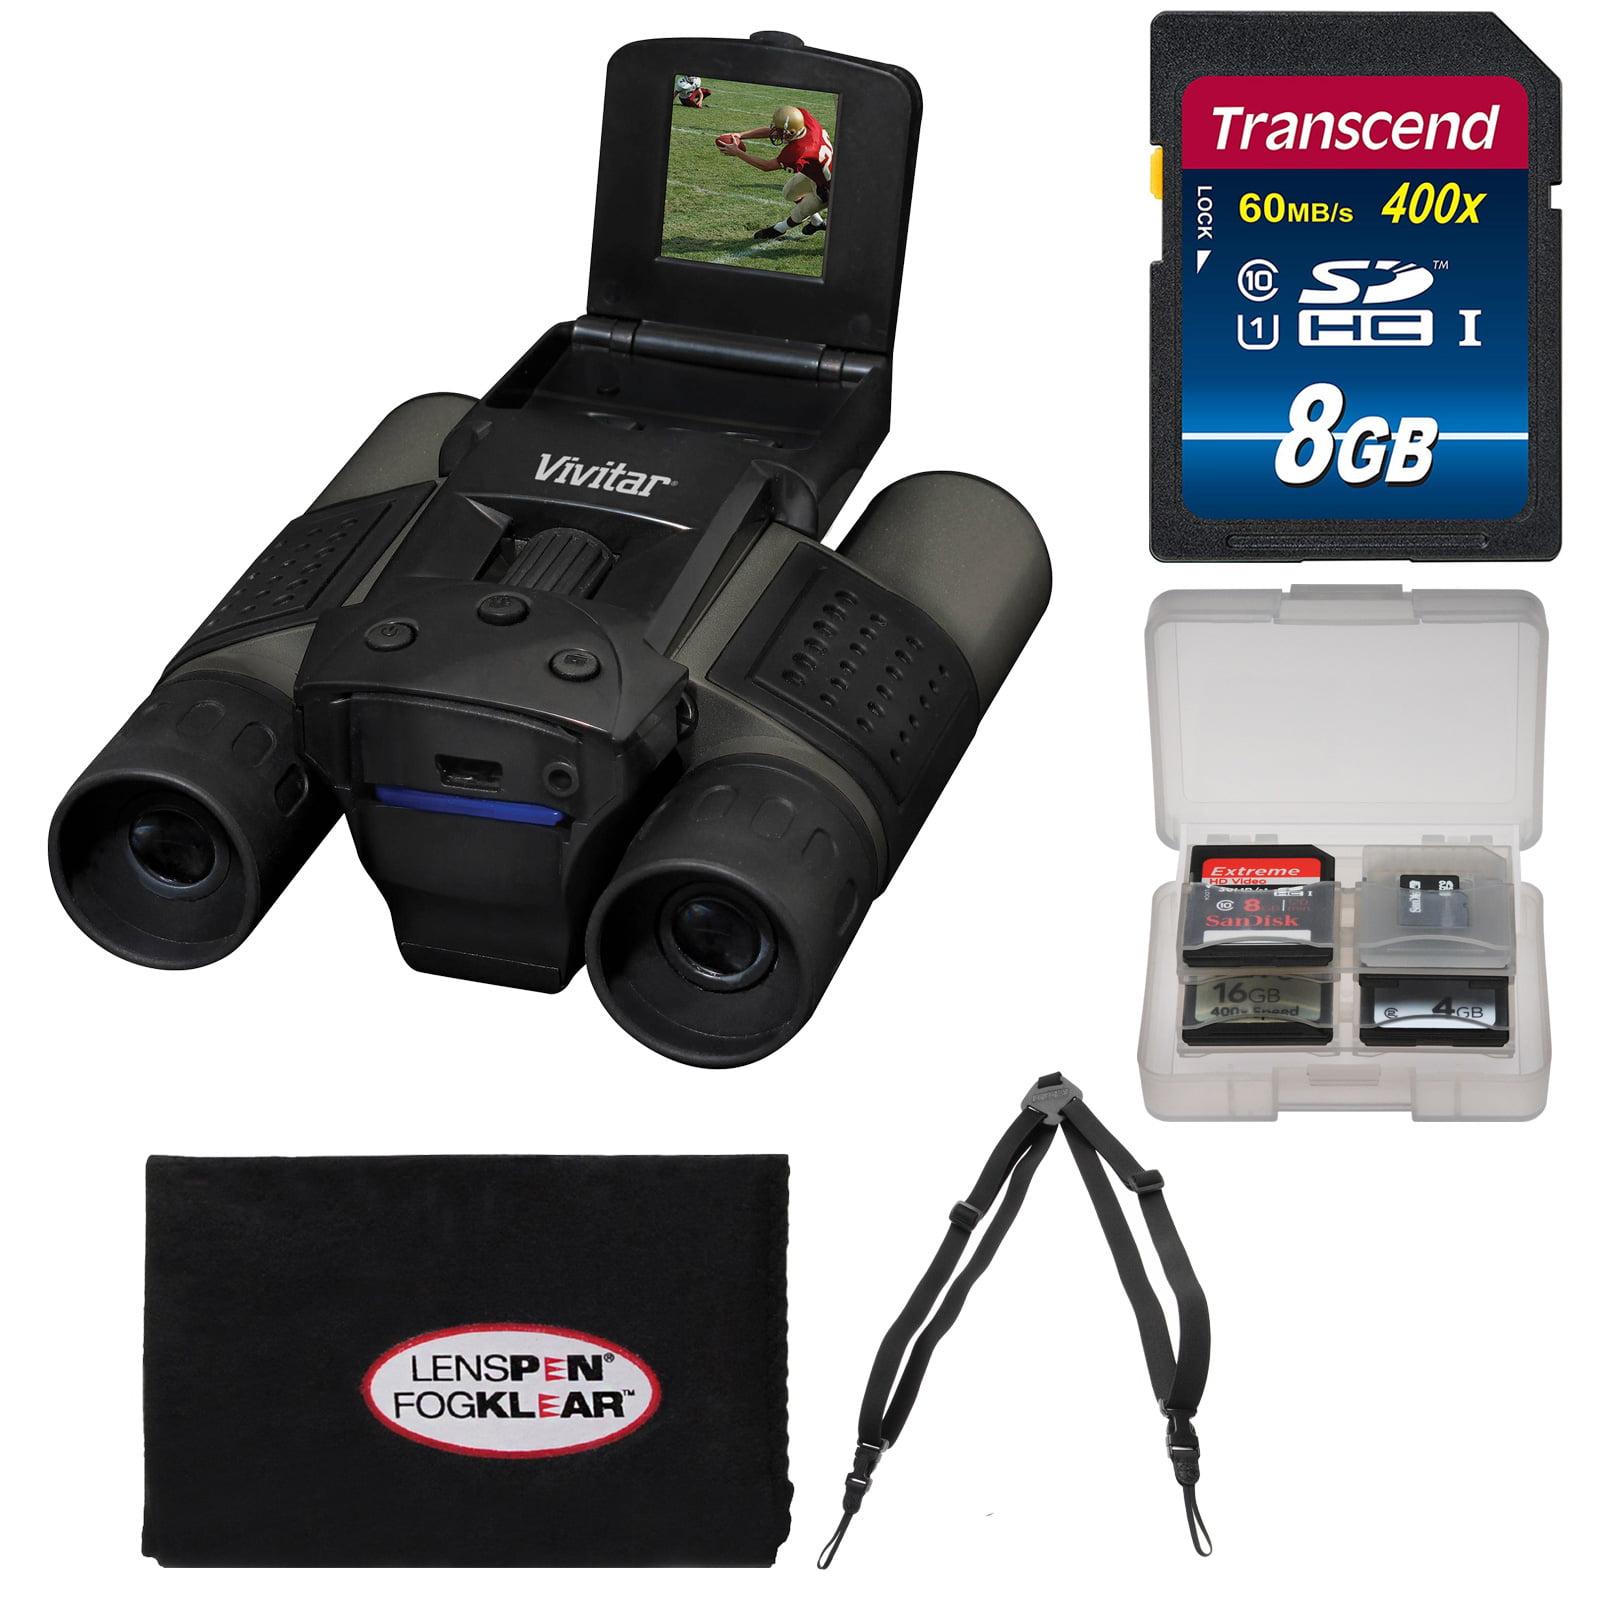 Vivitar 12x25 Binoculars with Built-in Digital Camera with 8GB Card + Harness + Accessory Kit by Vivitar